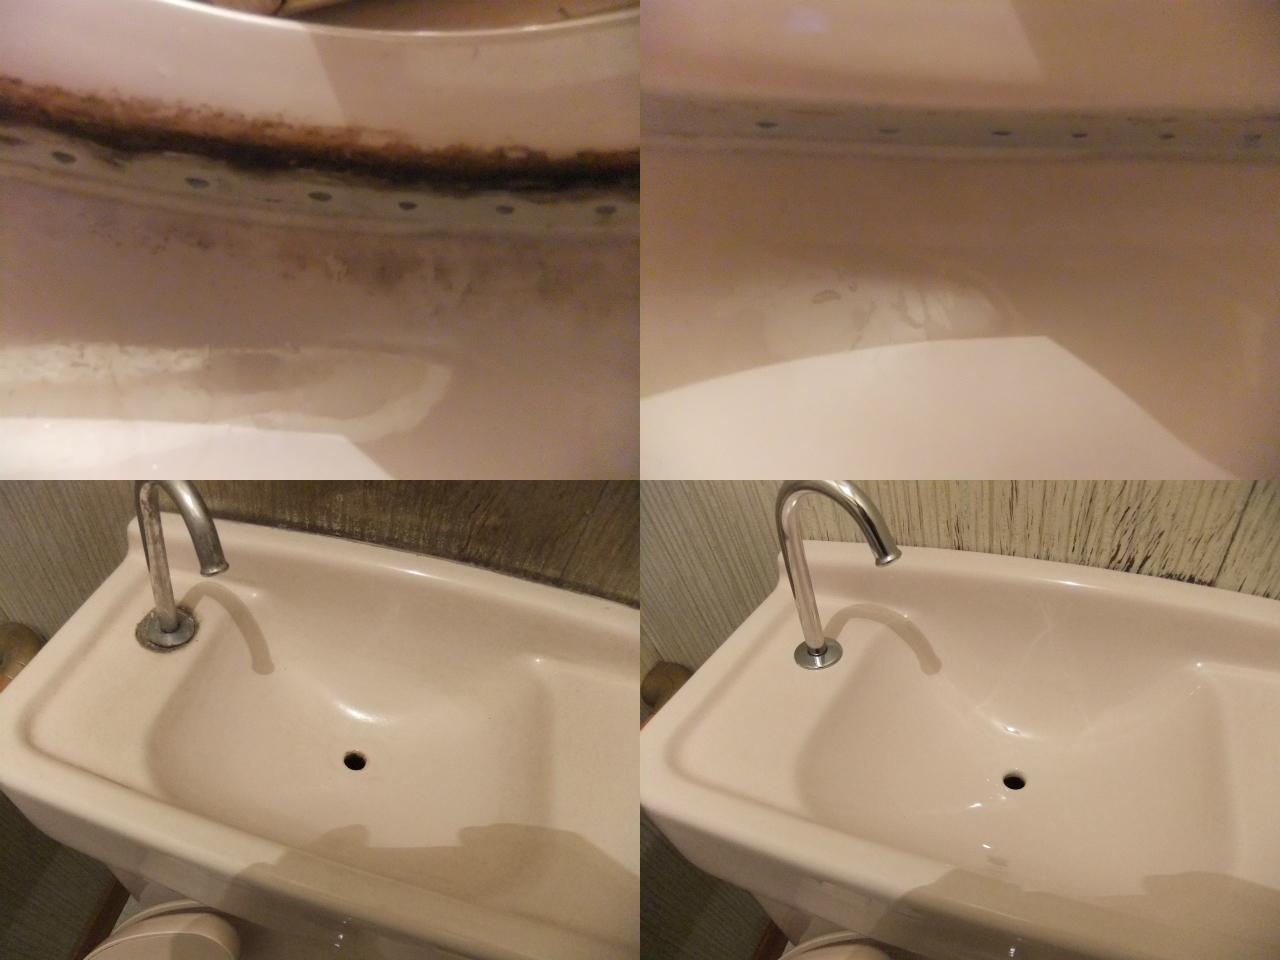 http://ajras.net/images/111114-toilet1.jpg